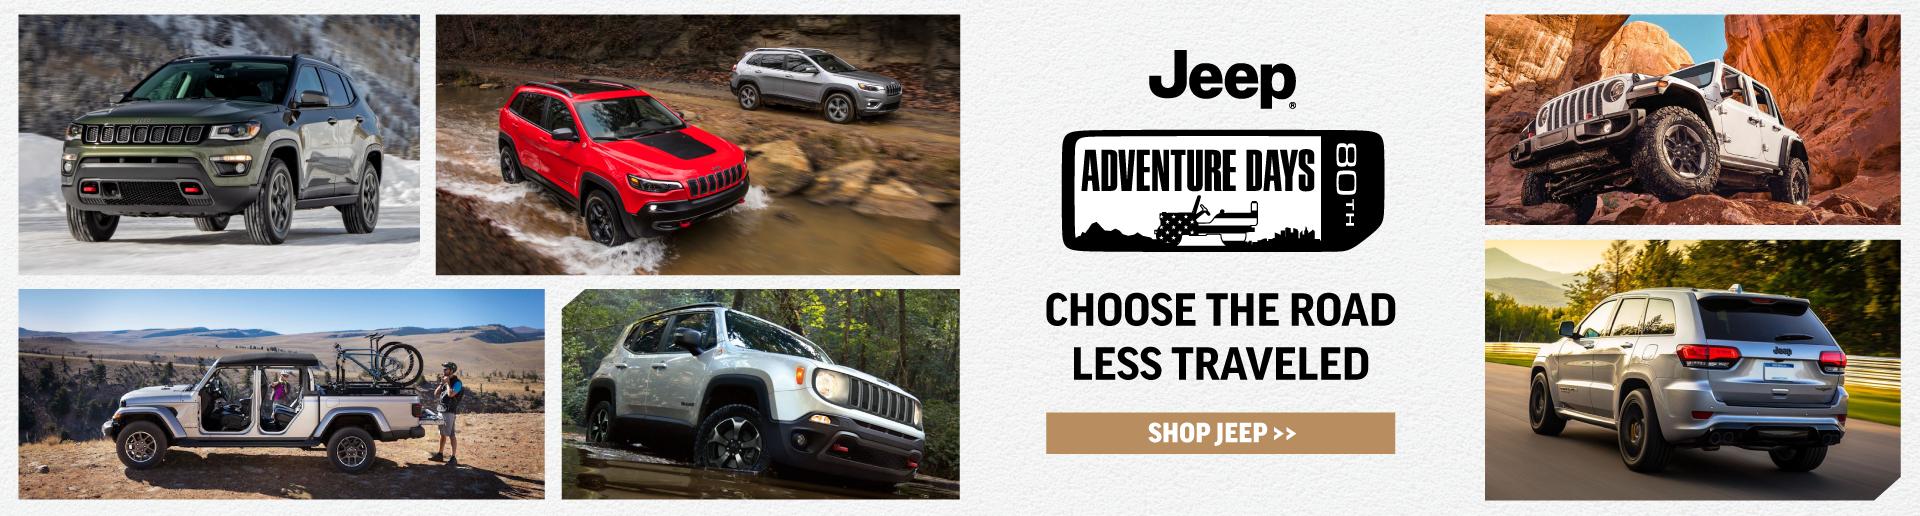 2020 Jeep Generic